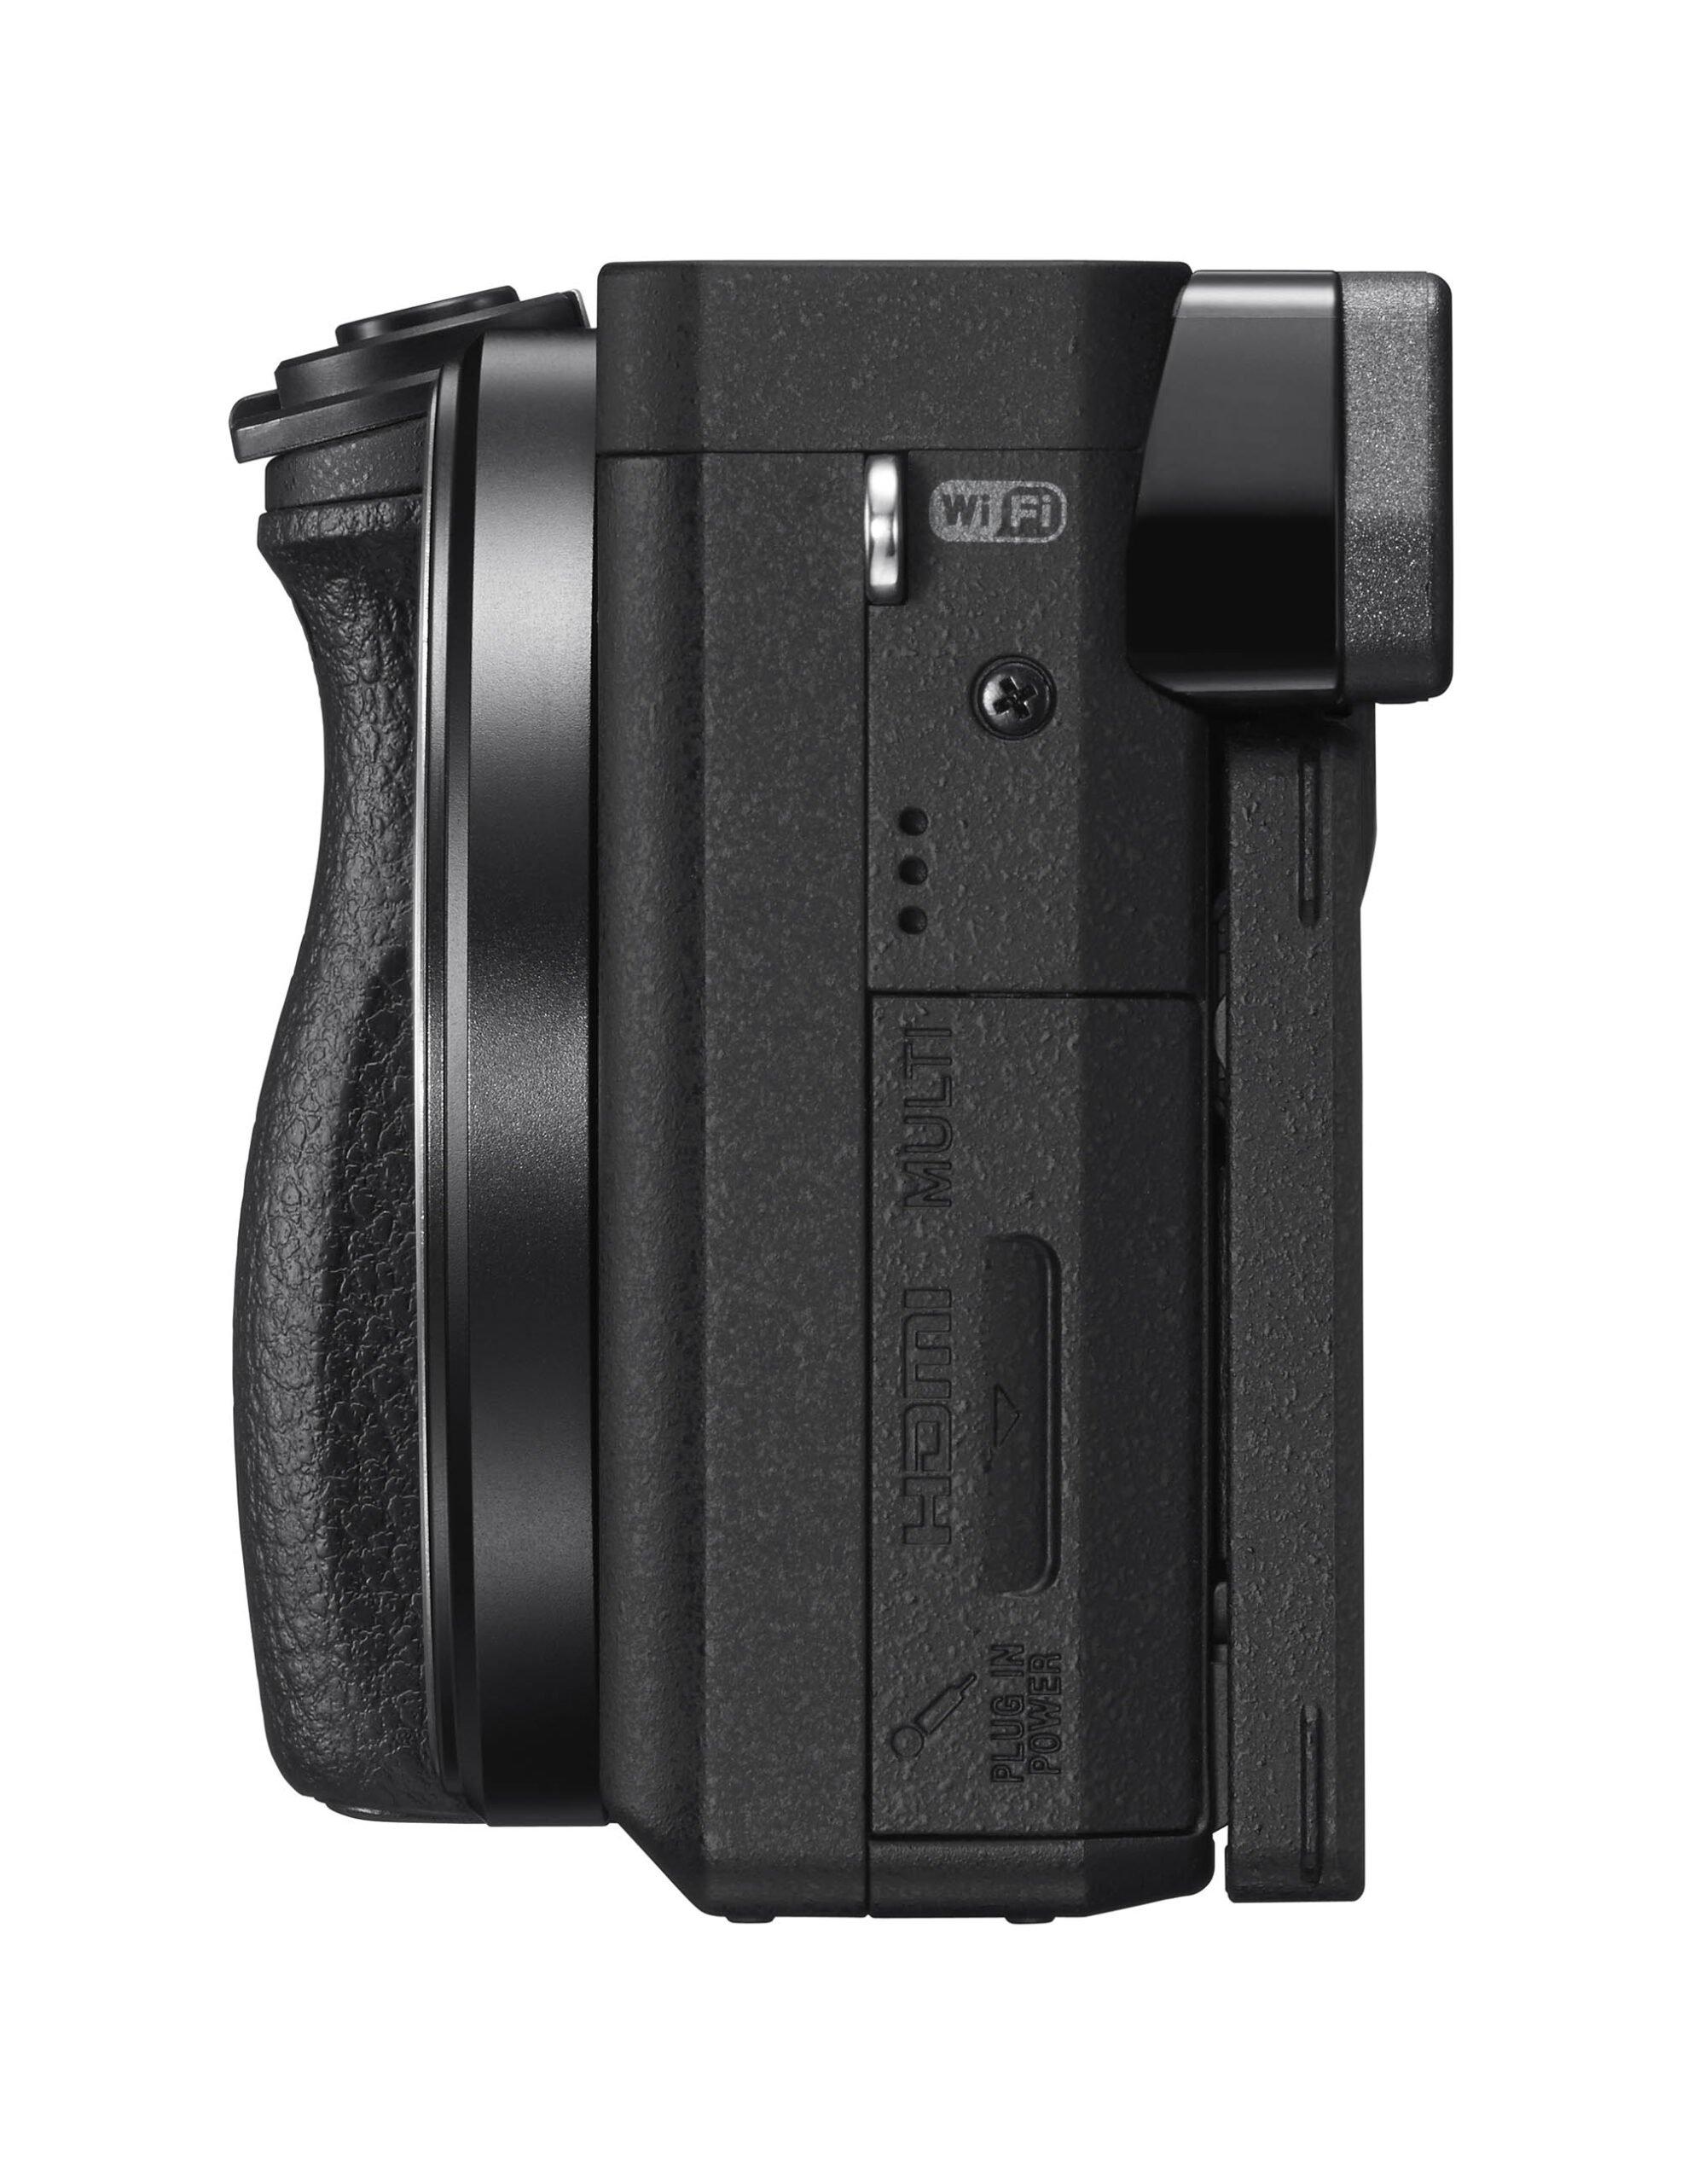 Sony a6300 Right Ports